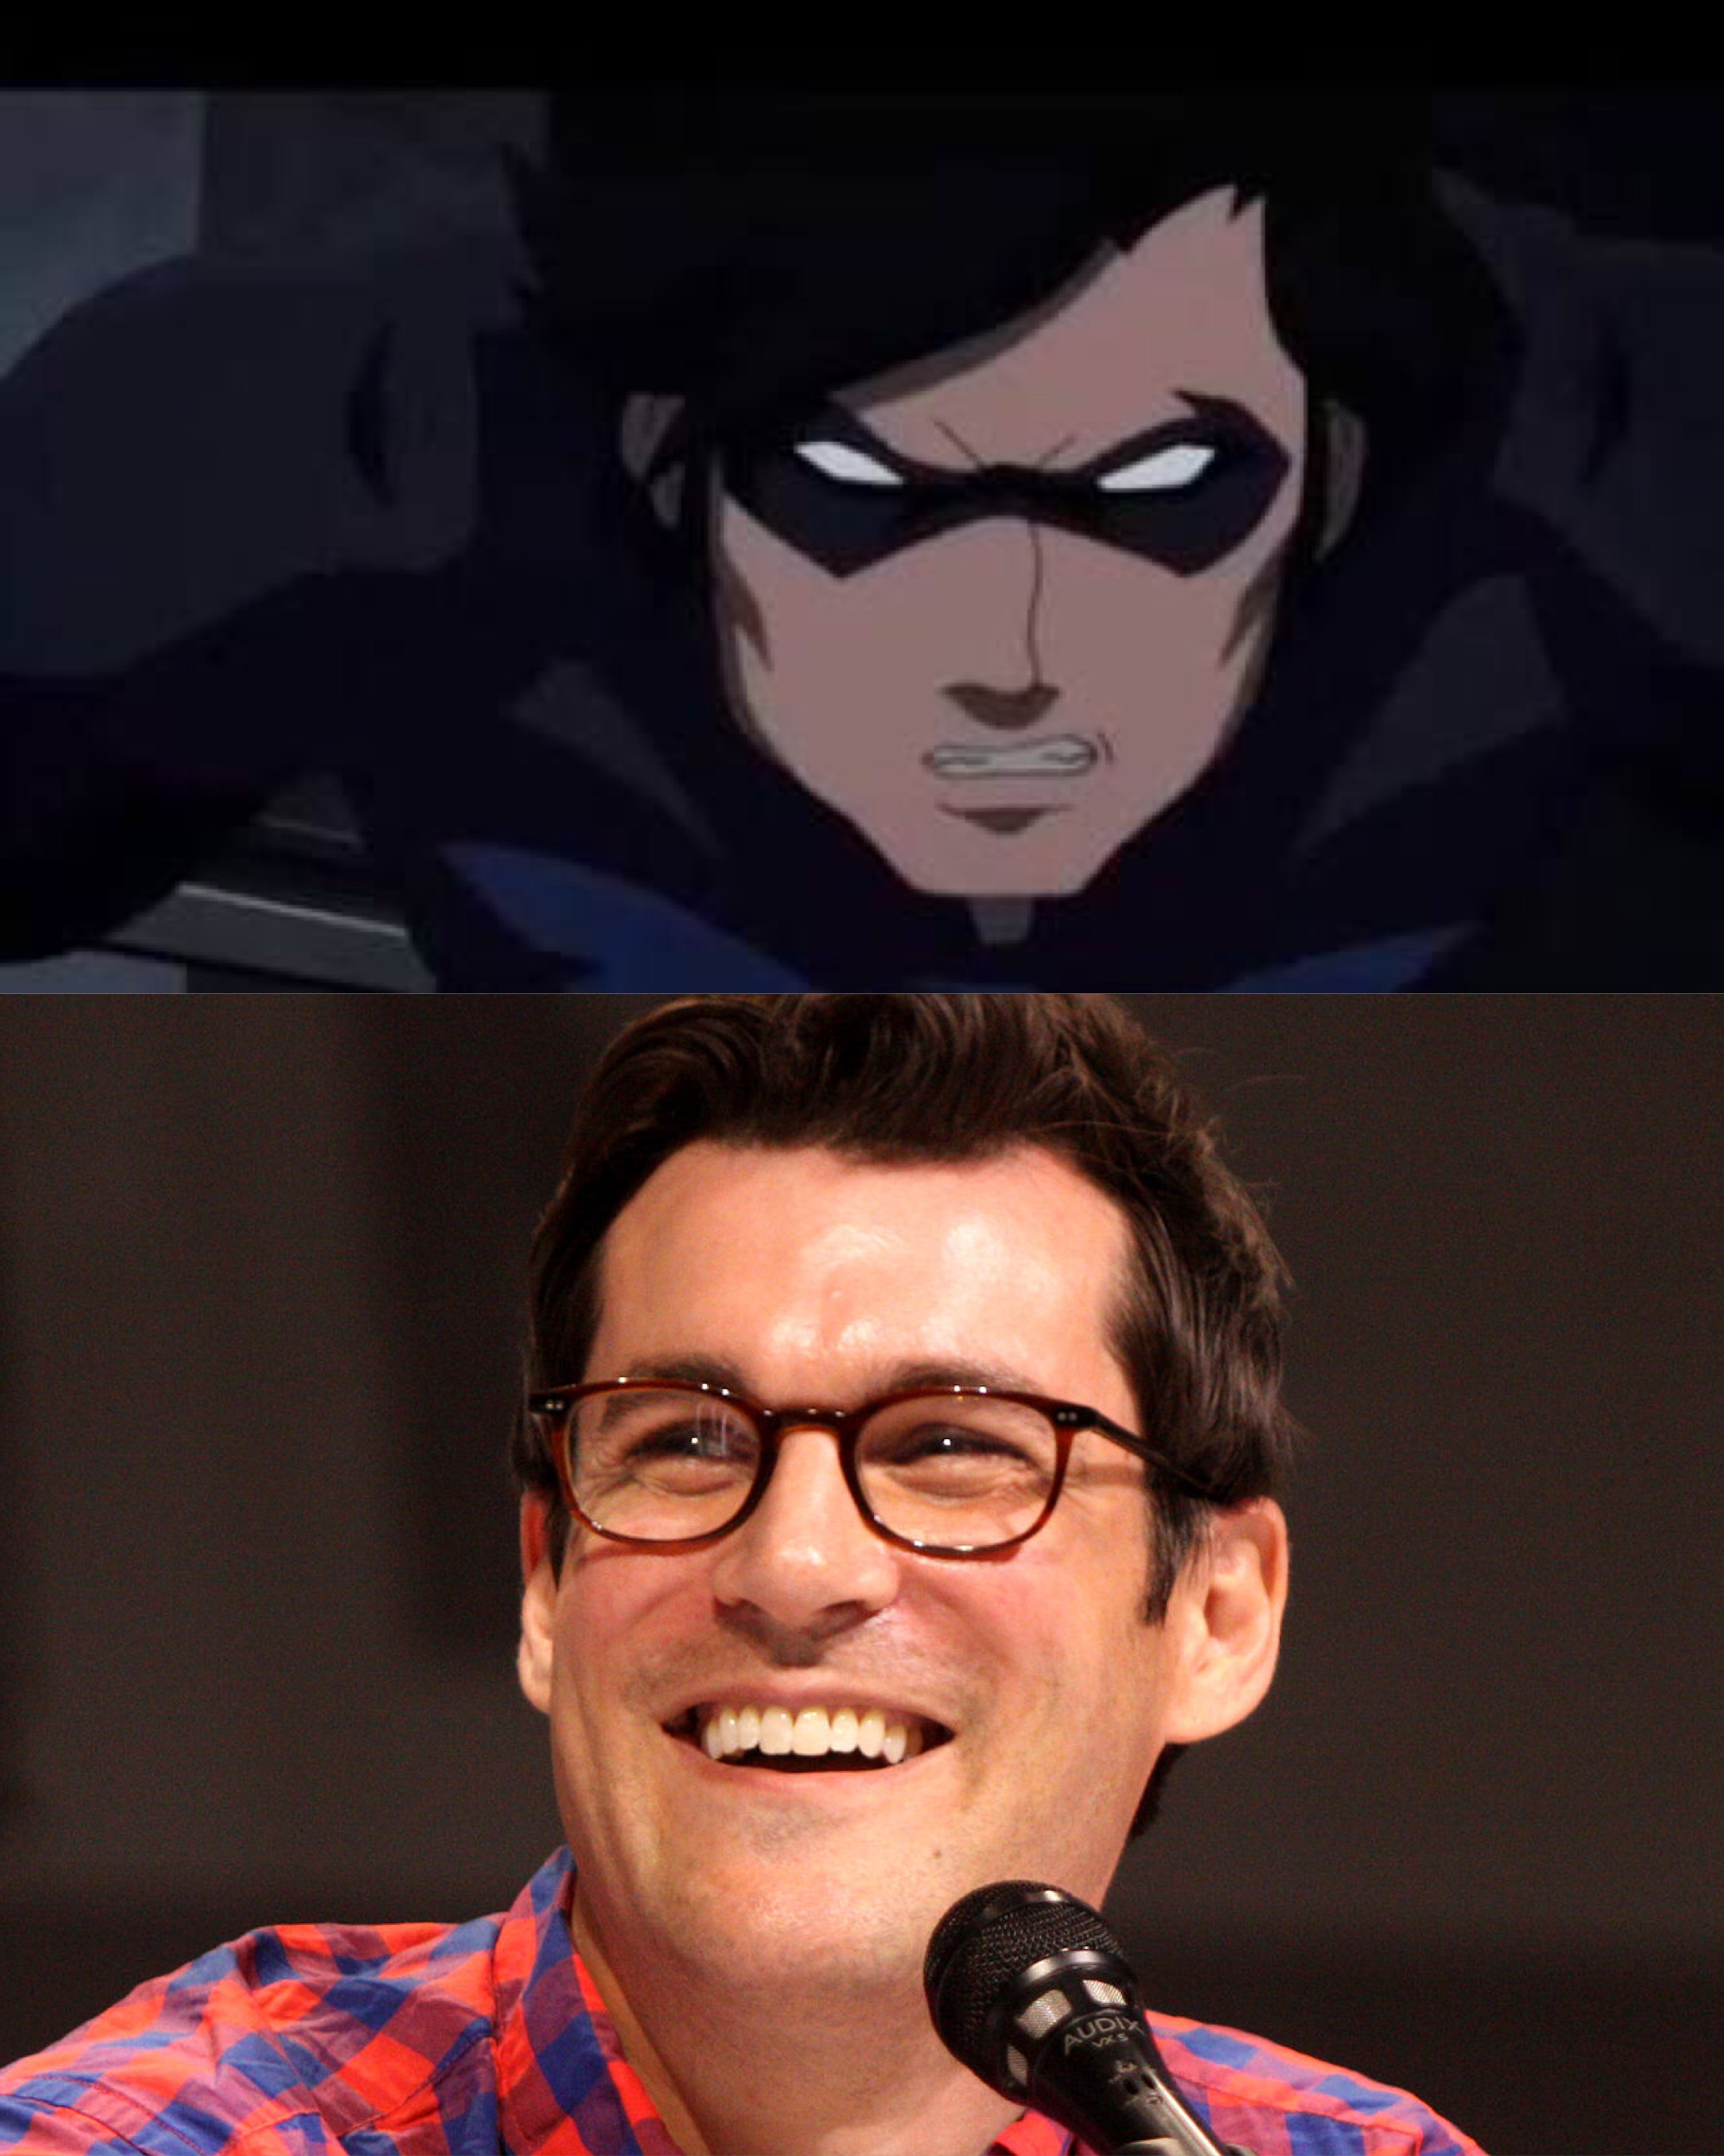 Nightwing!